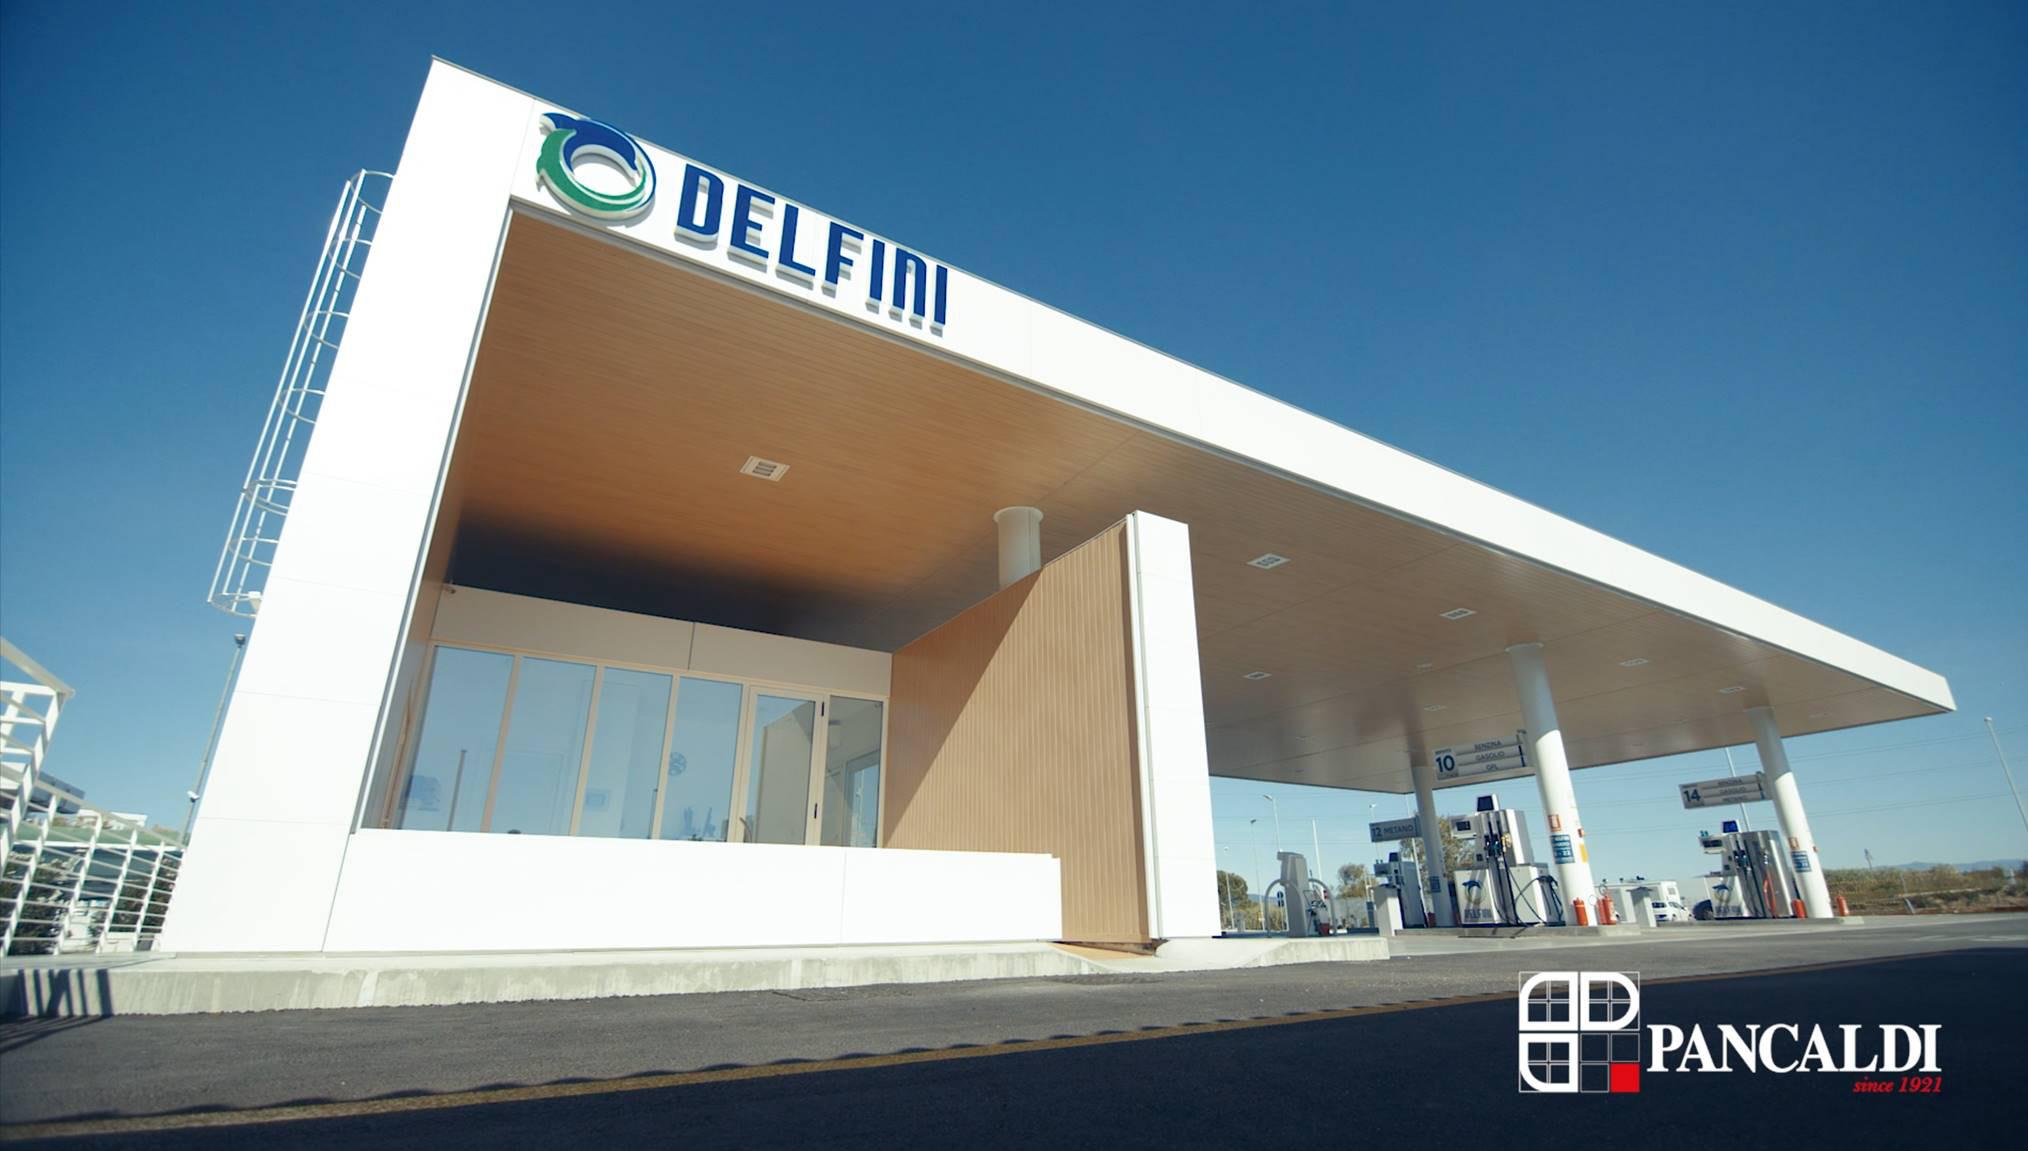 print Delfini